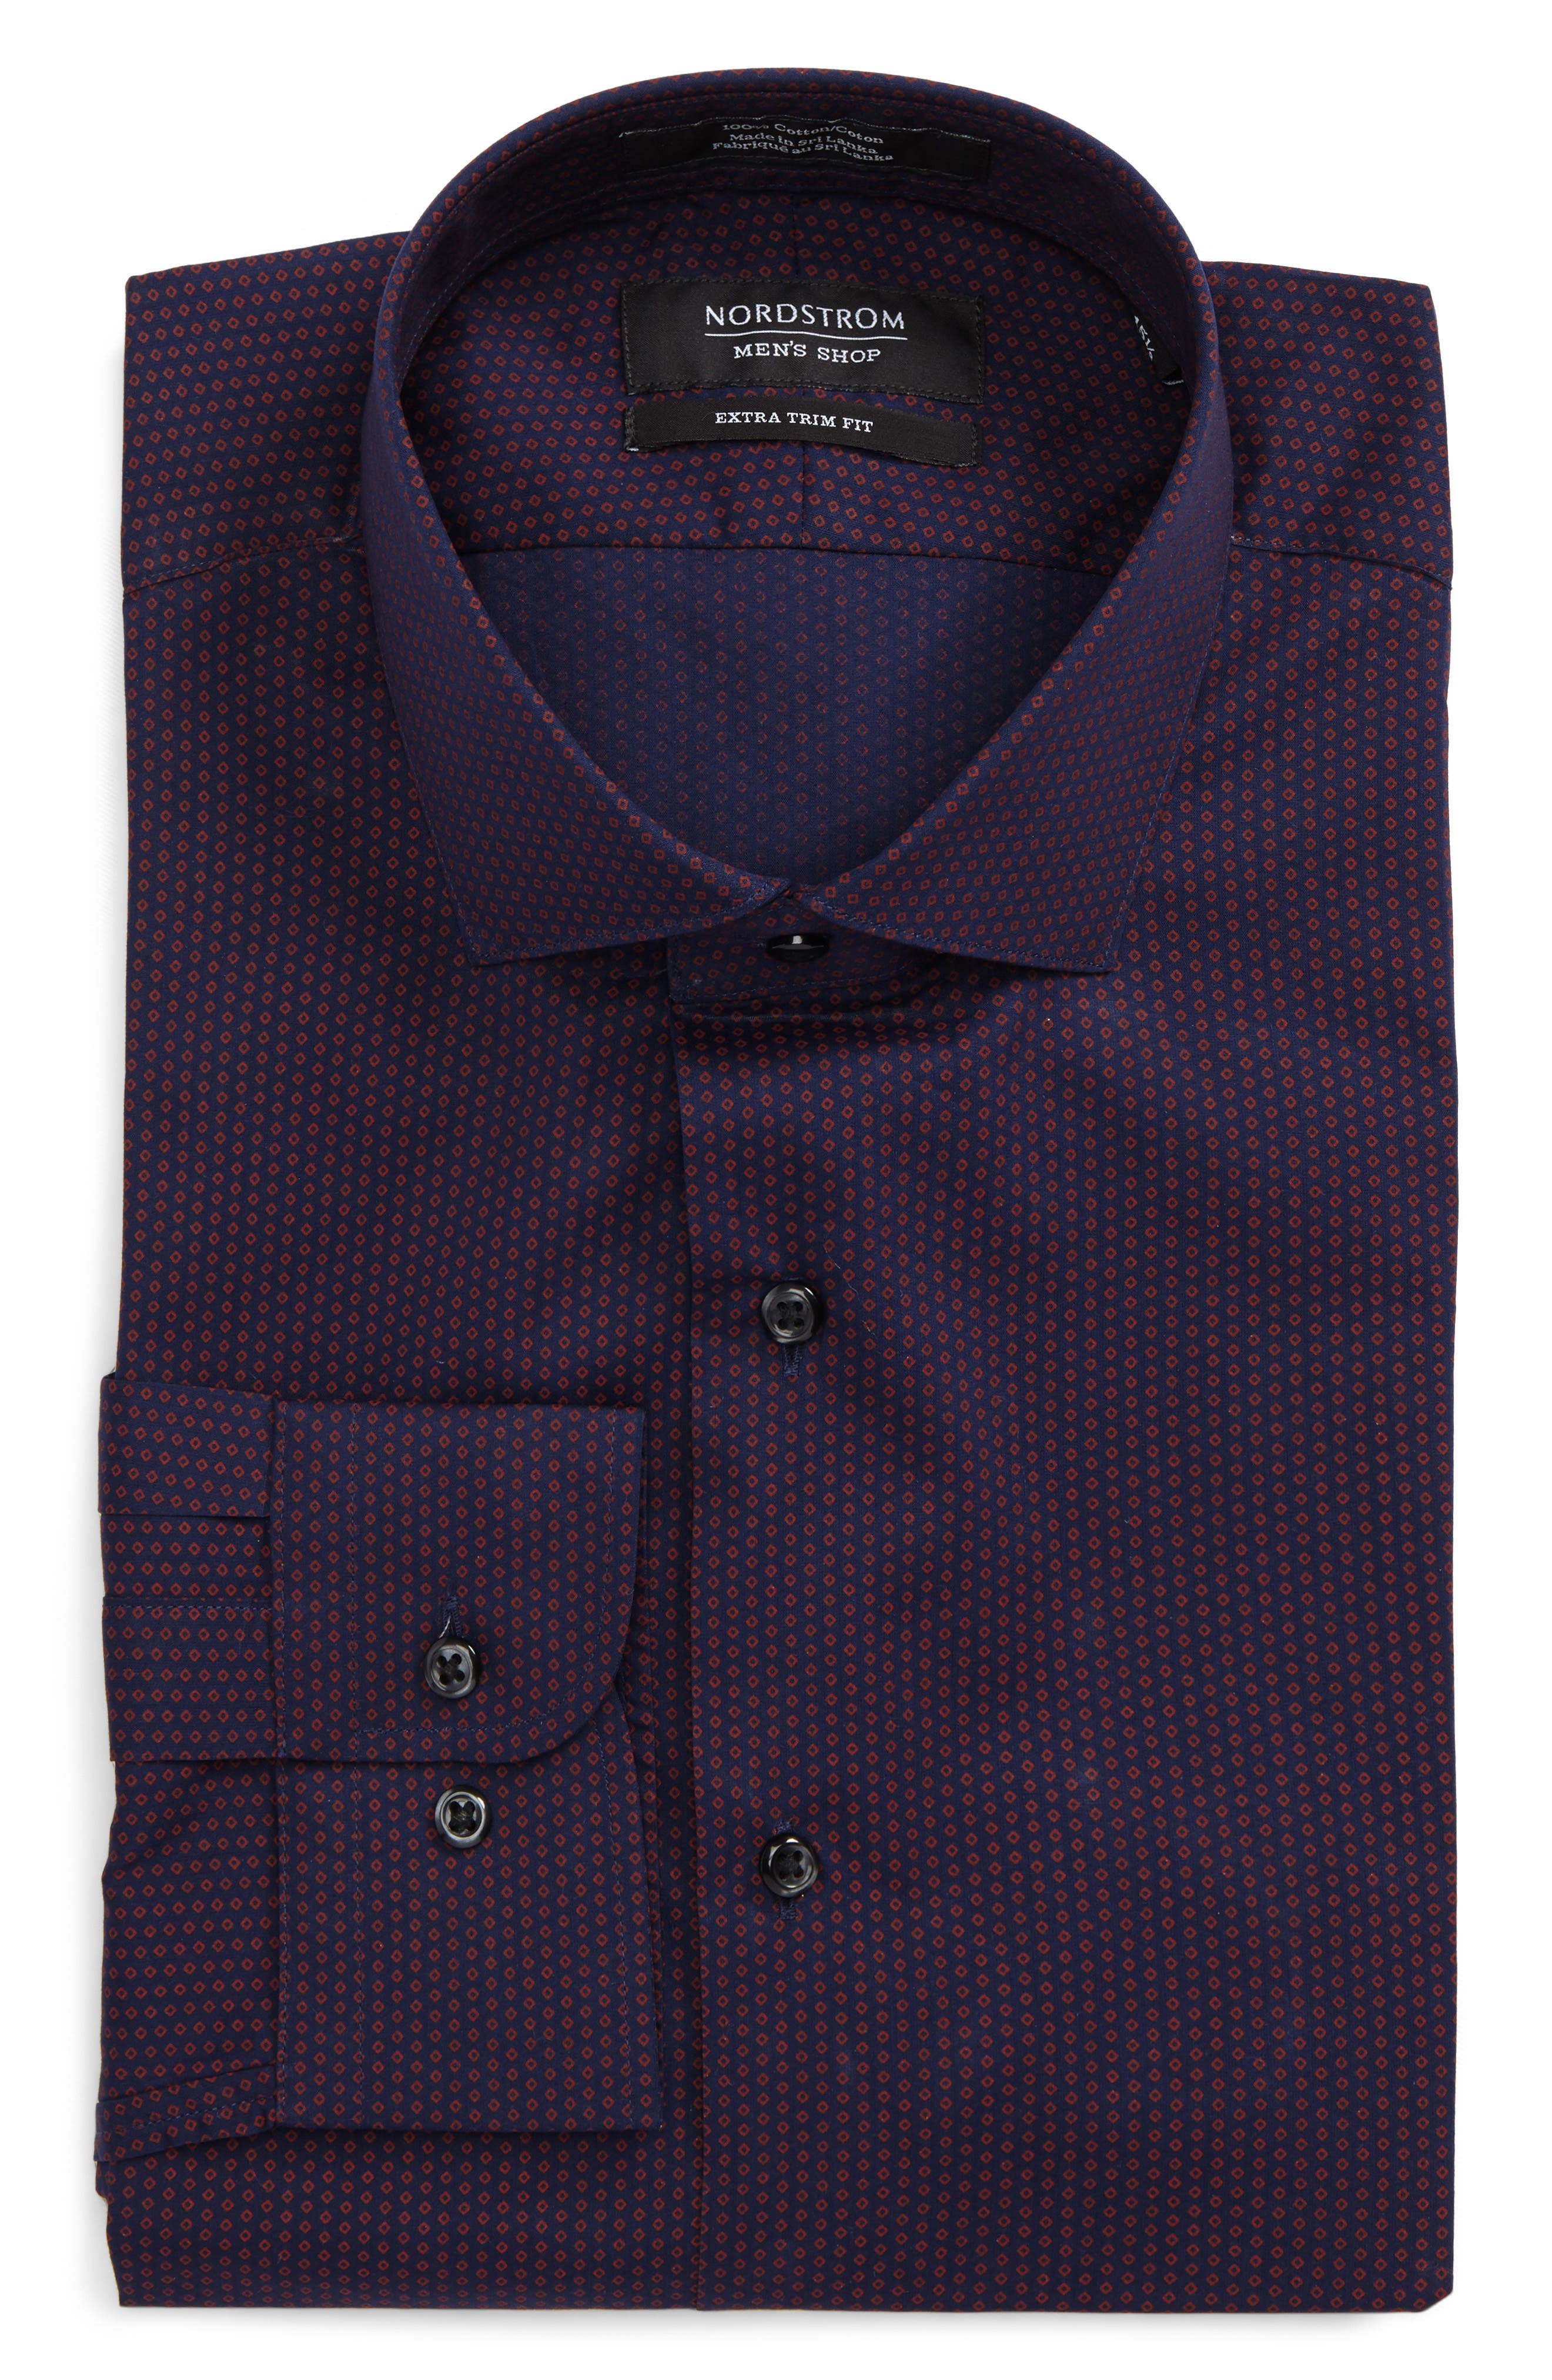 Main Image - Nordstrom Men's Shop Extra Trim Fit Dress Shirt